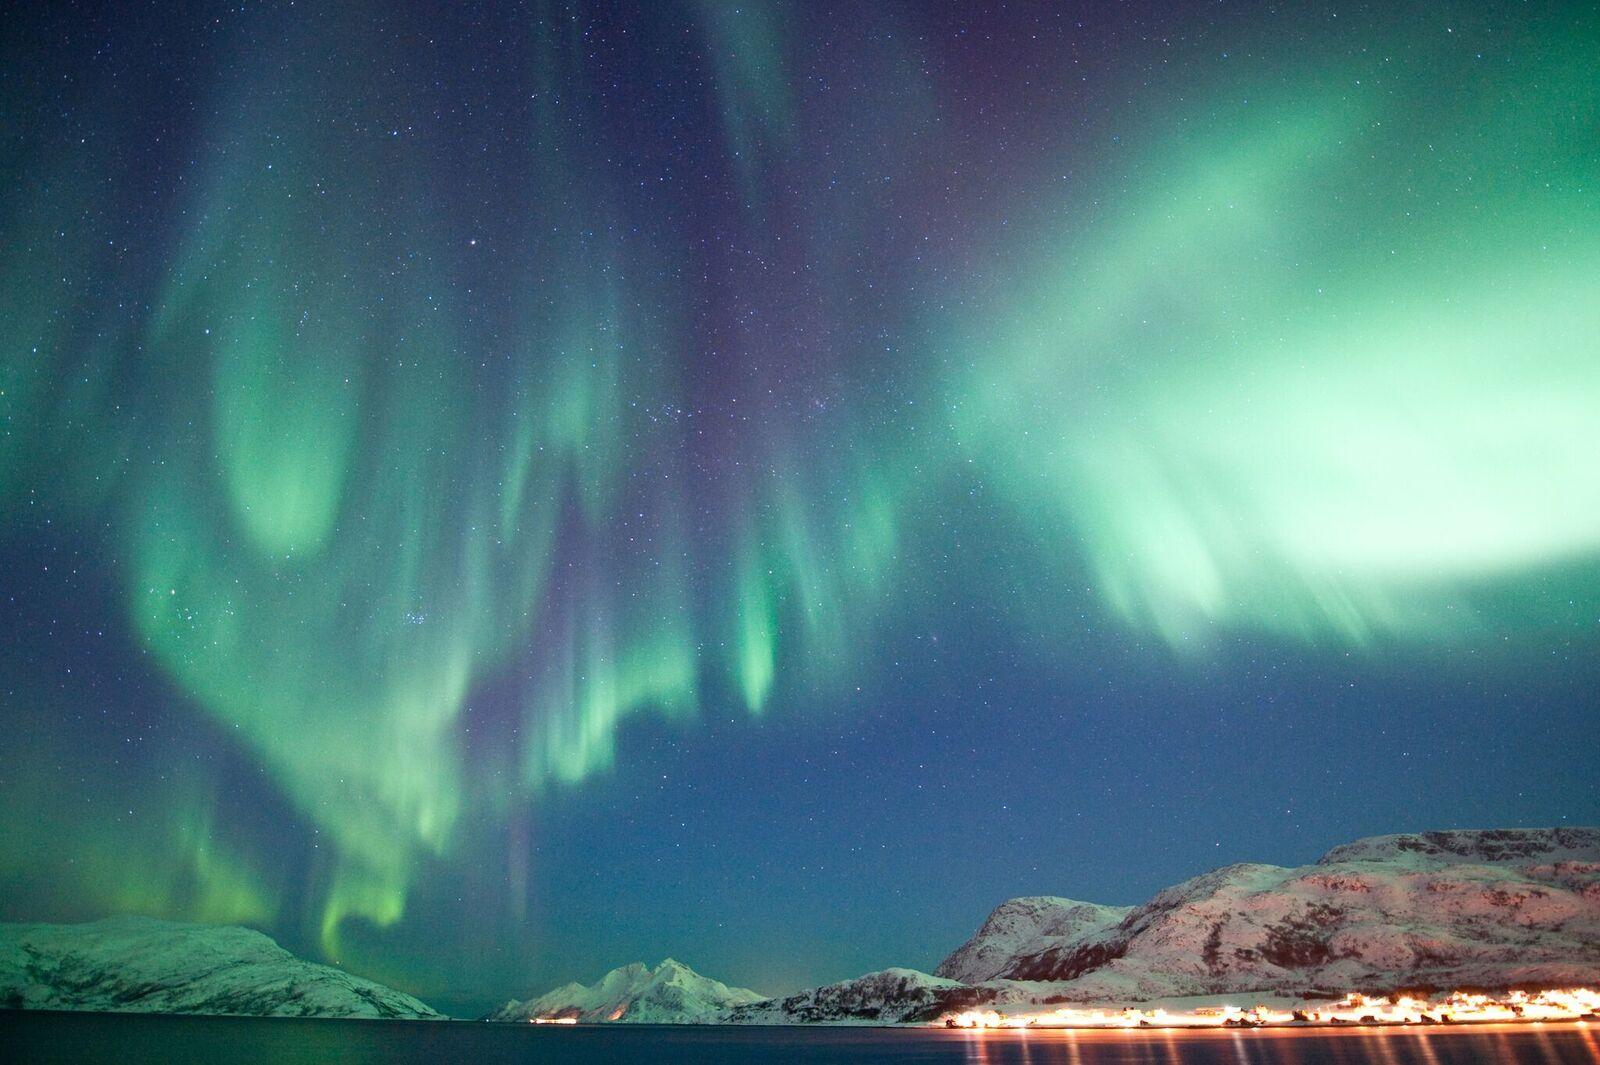 001887_Gaute Bruvik_www.nordnorge.com_Tromsoe_preview_preview.jpg